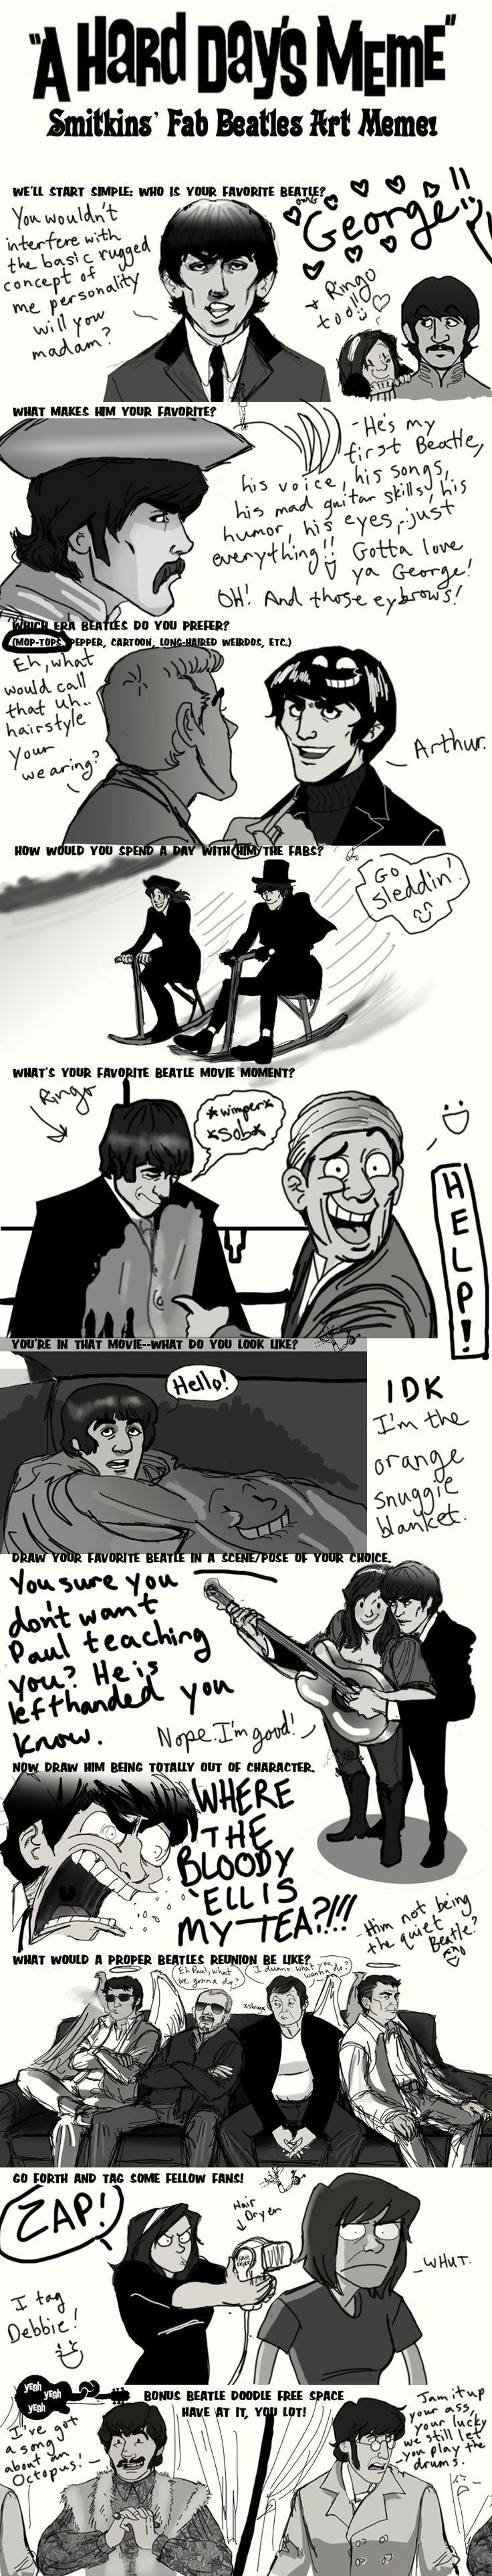 Beatles_Meme_by_TitanicGal1912.png 752×3,935 pixels